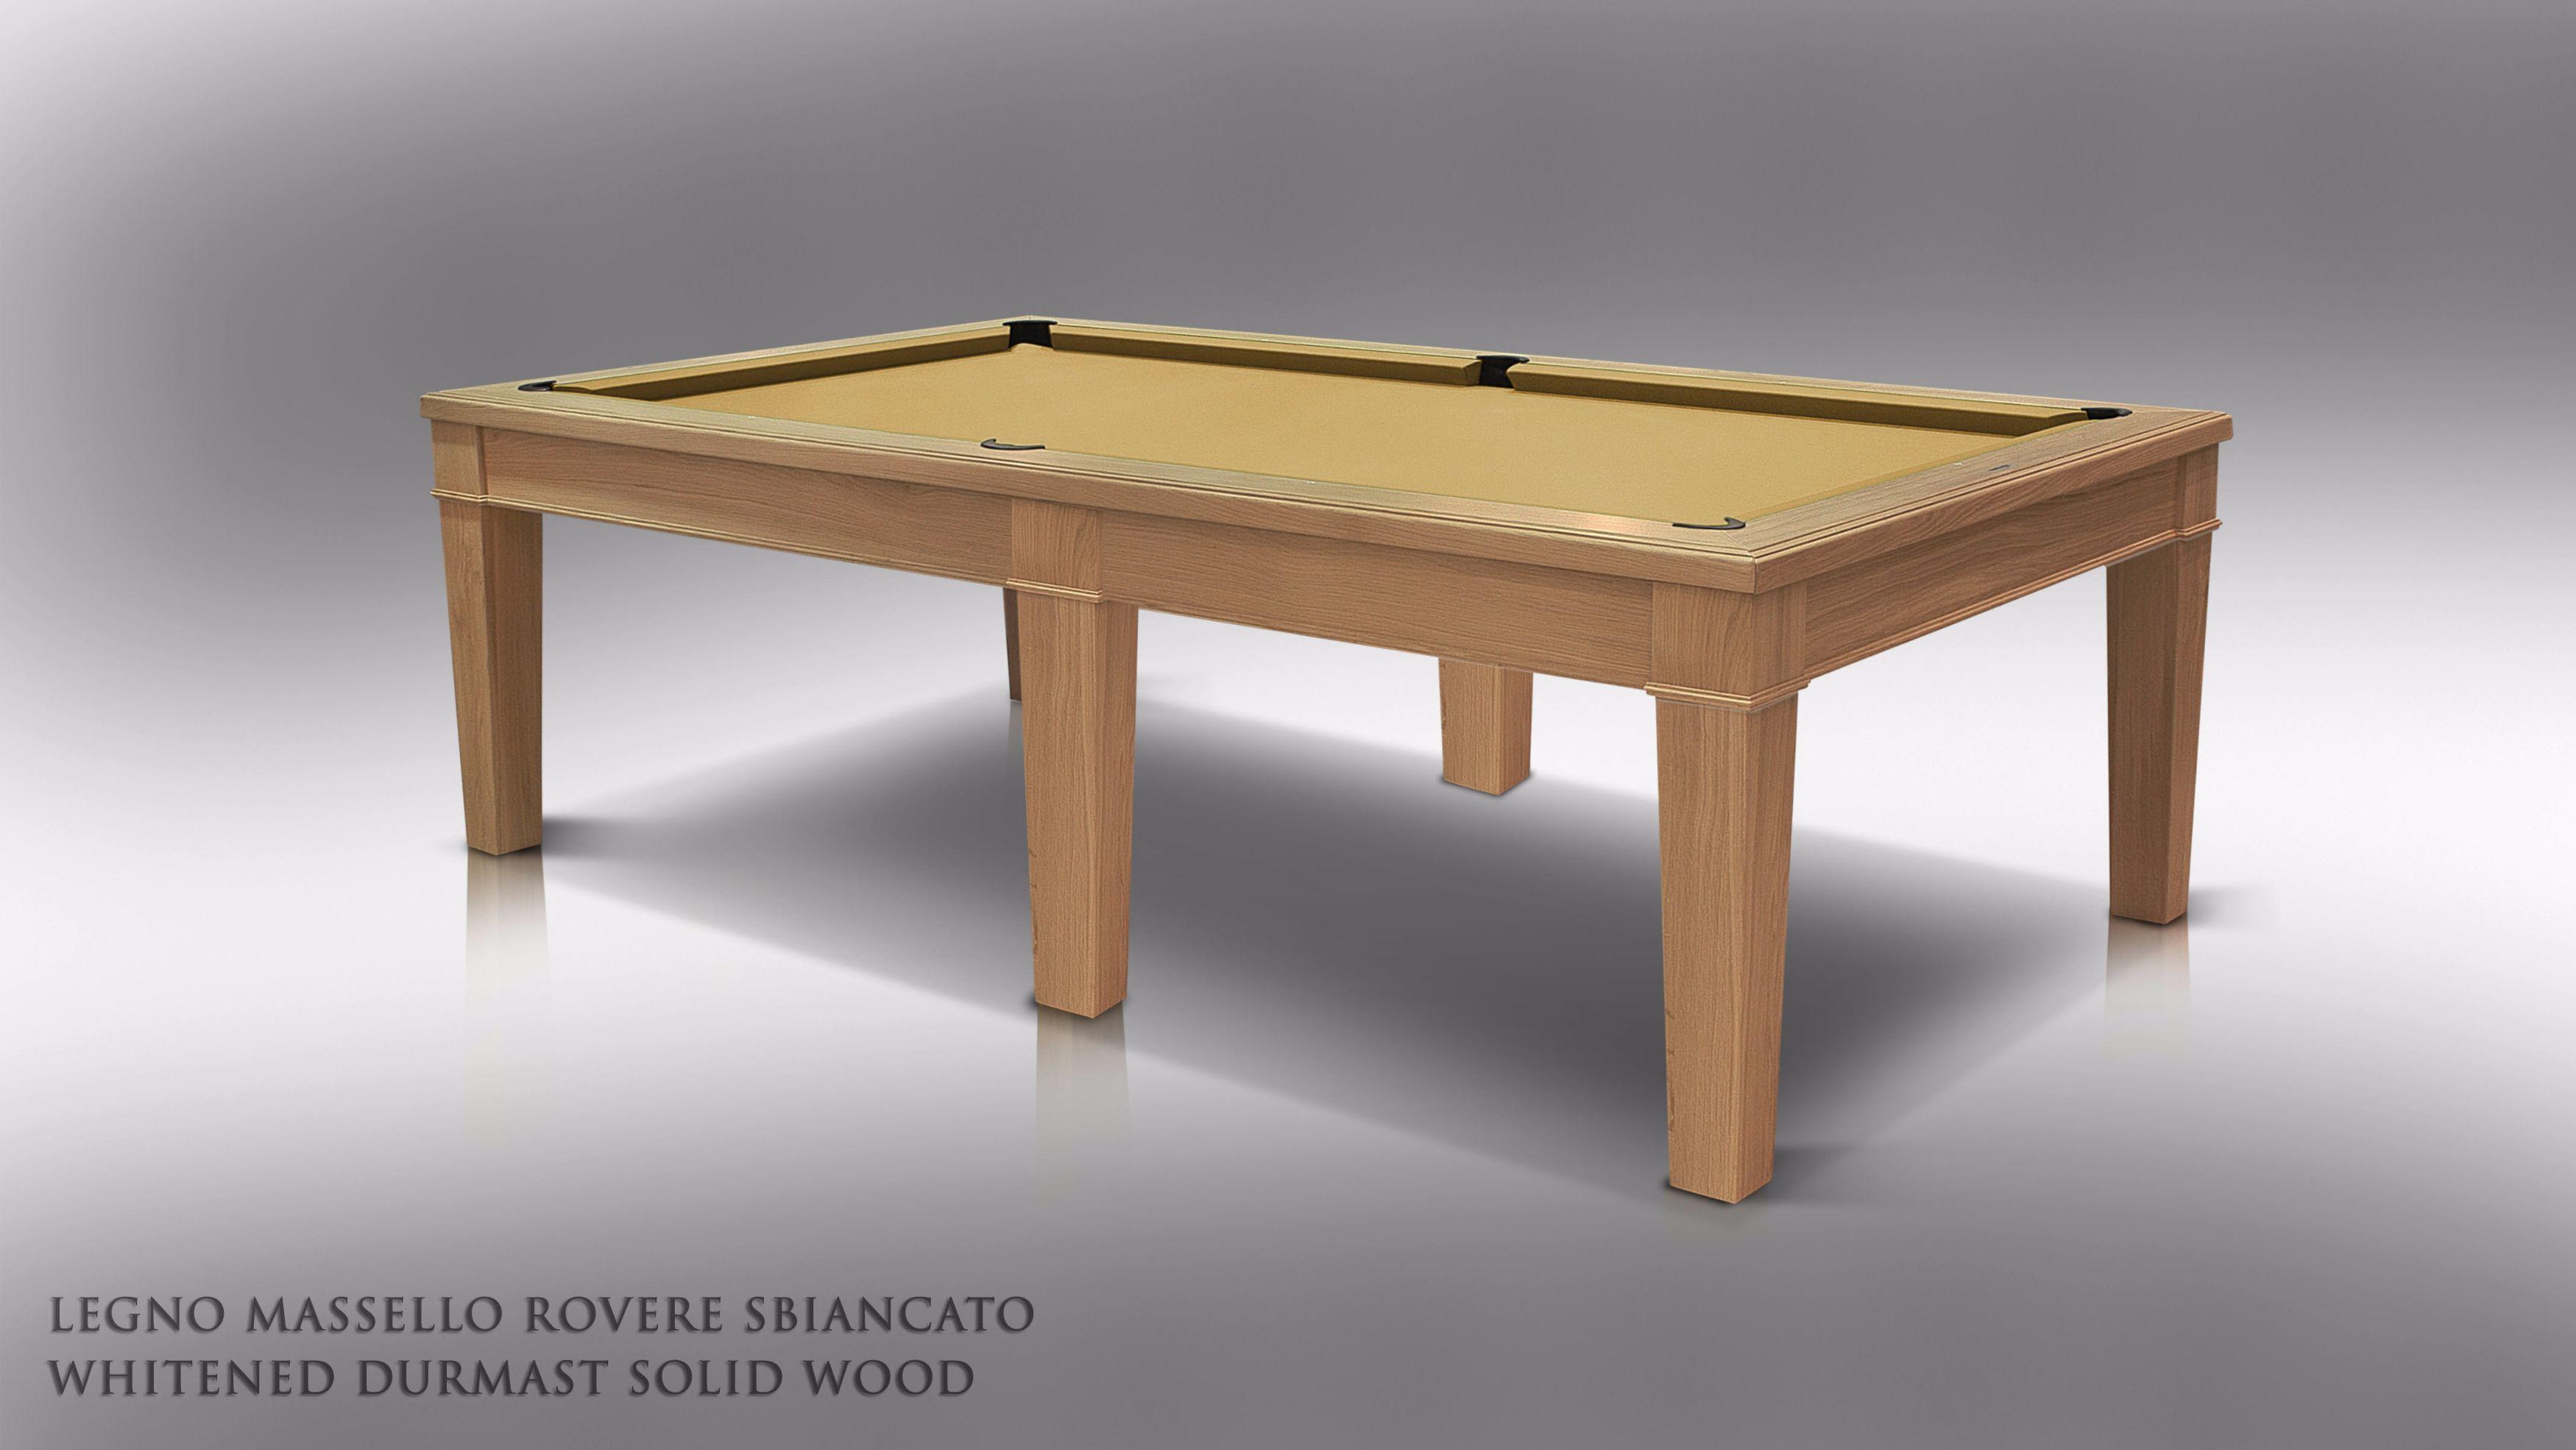 Canossa Style Billiard Pool Table 6 - 8 bases 1